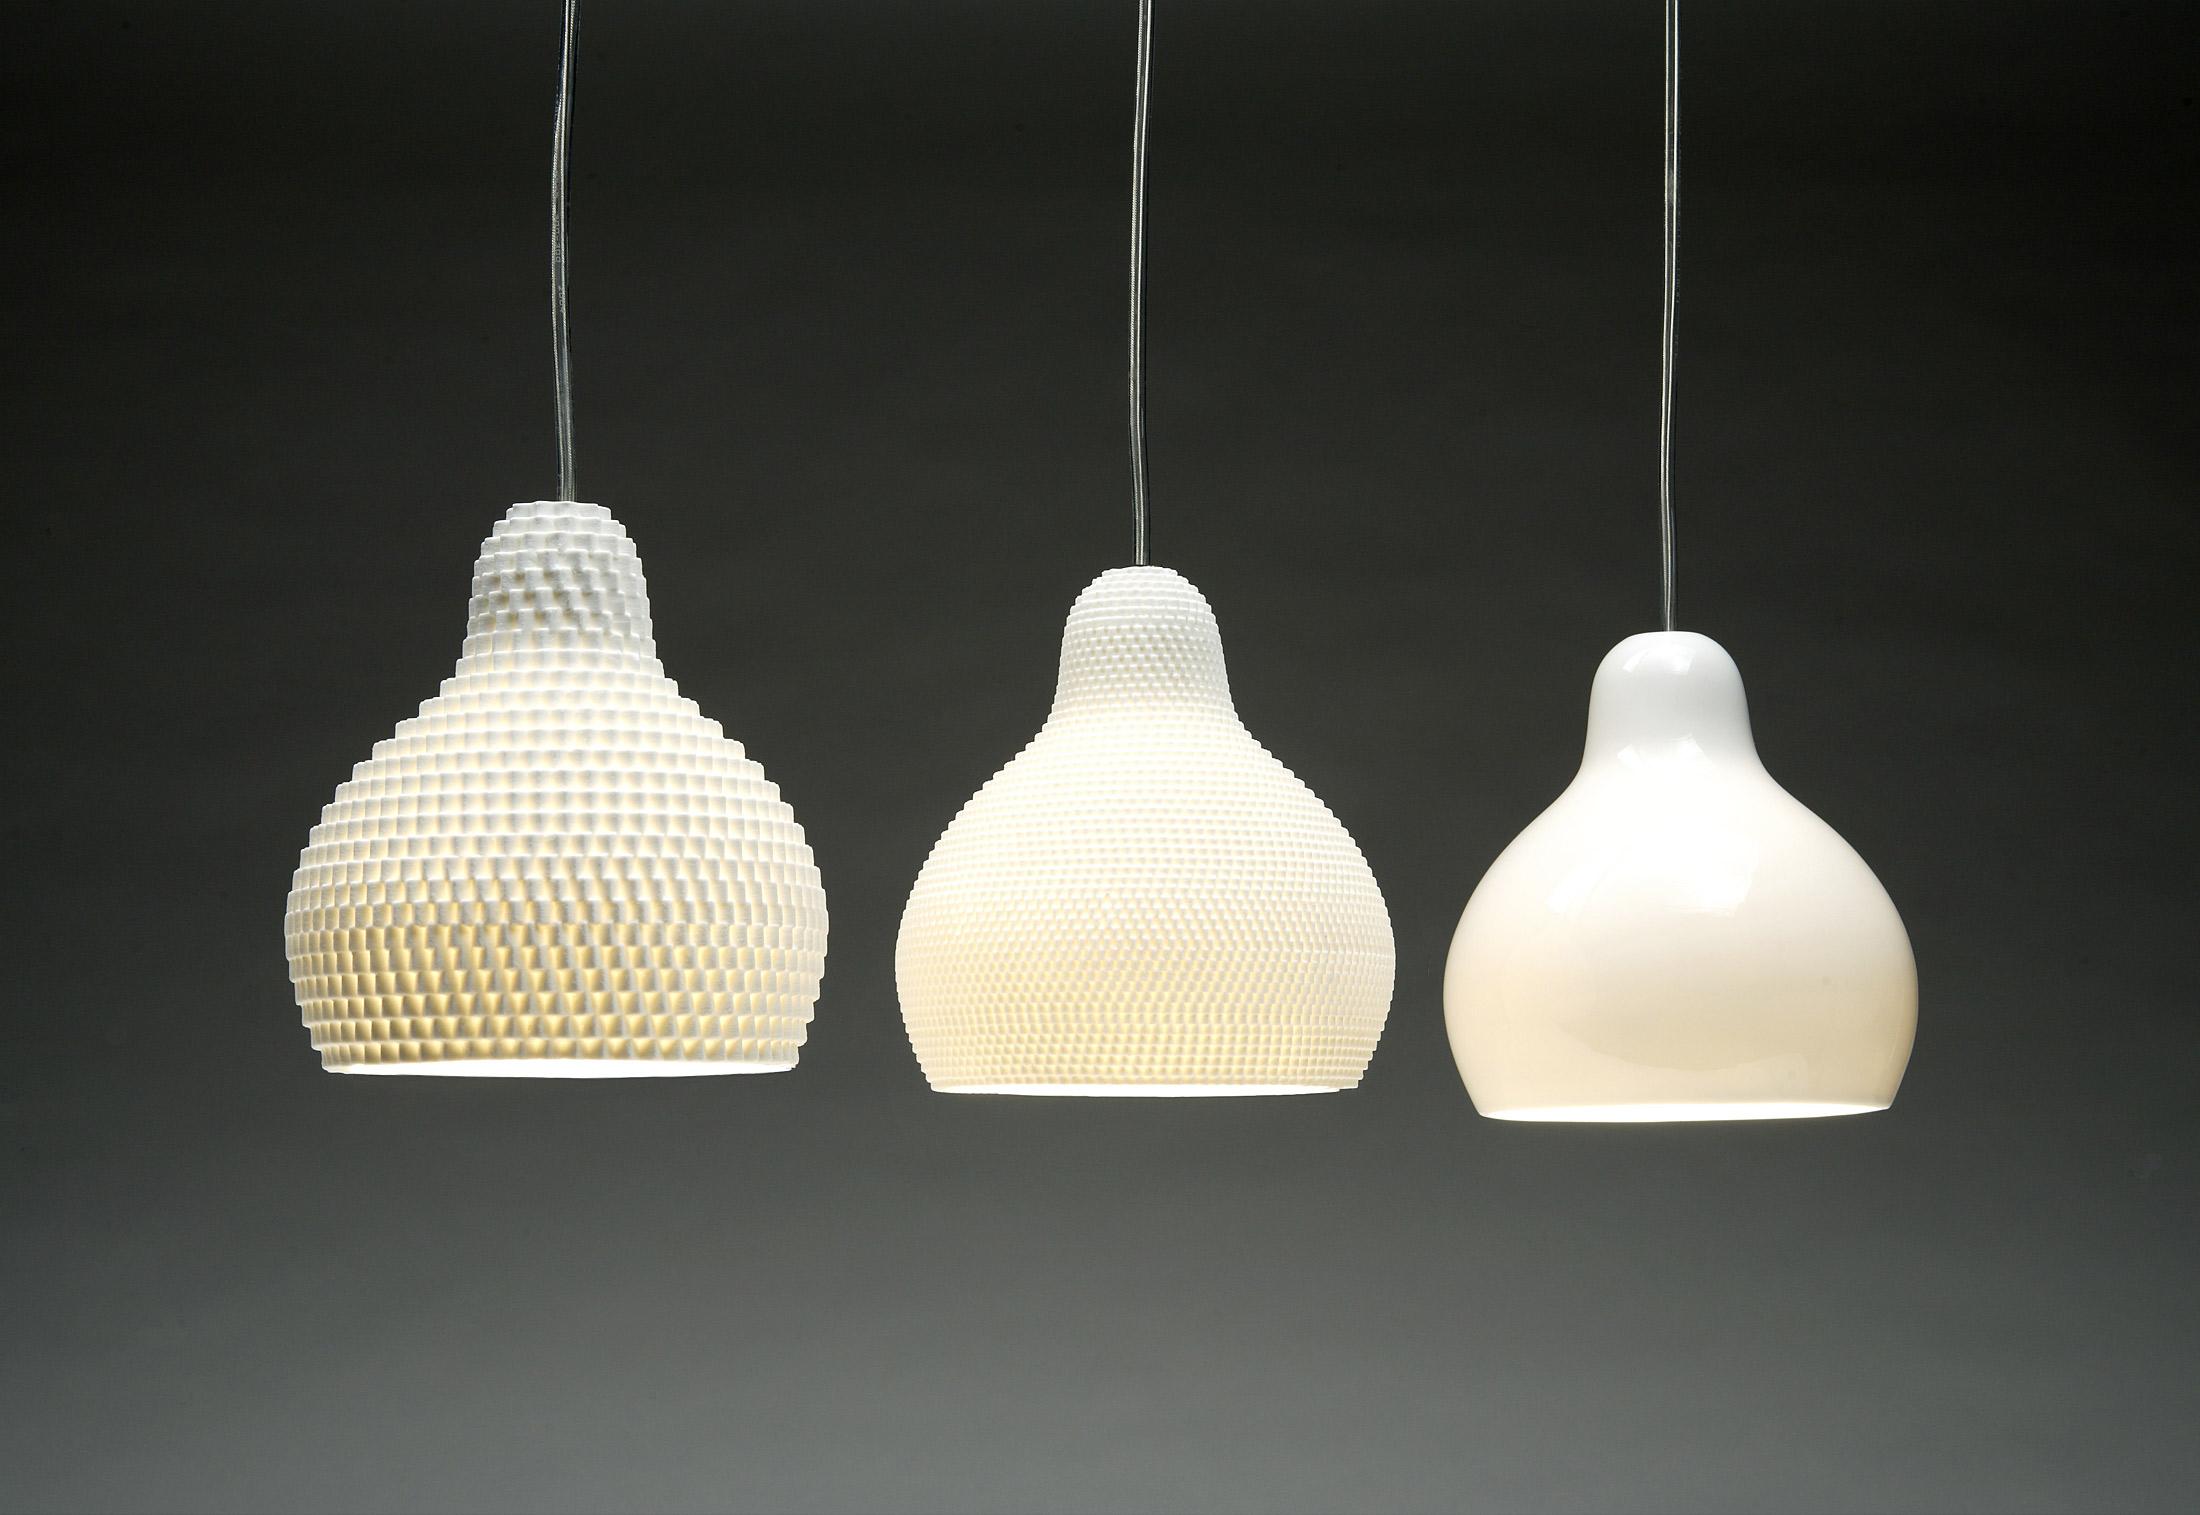 lampe-72dpi-4 Spannende Lampen Frankfurt Am Main Dekorationen